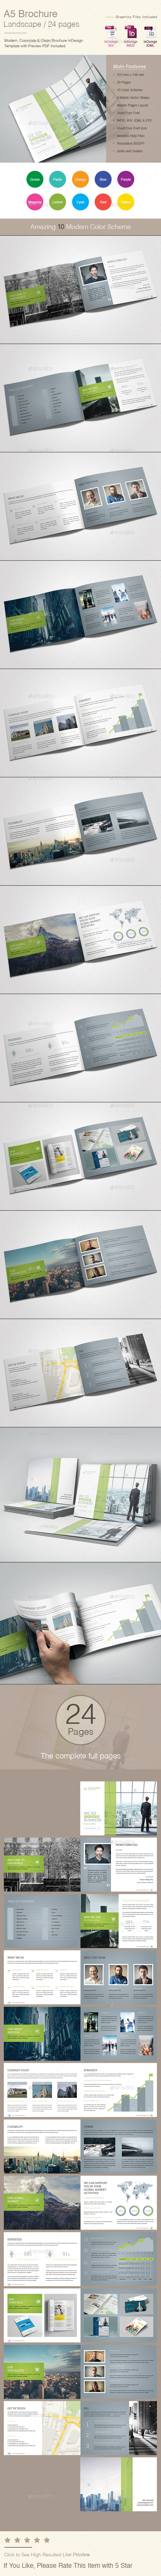 A5 Brochure Landscape - Corporate Brochures